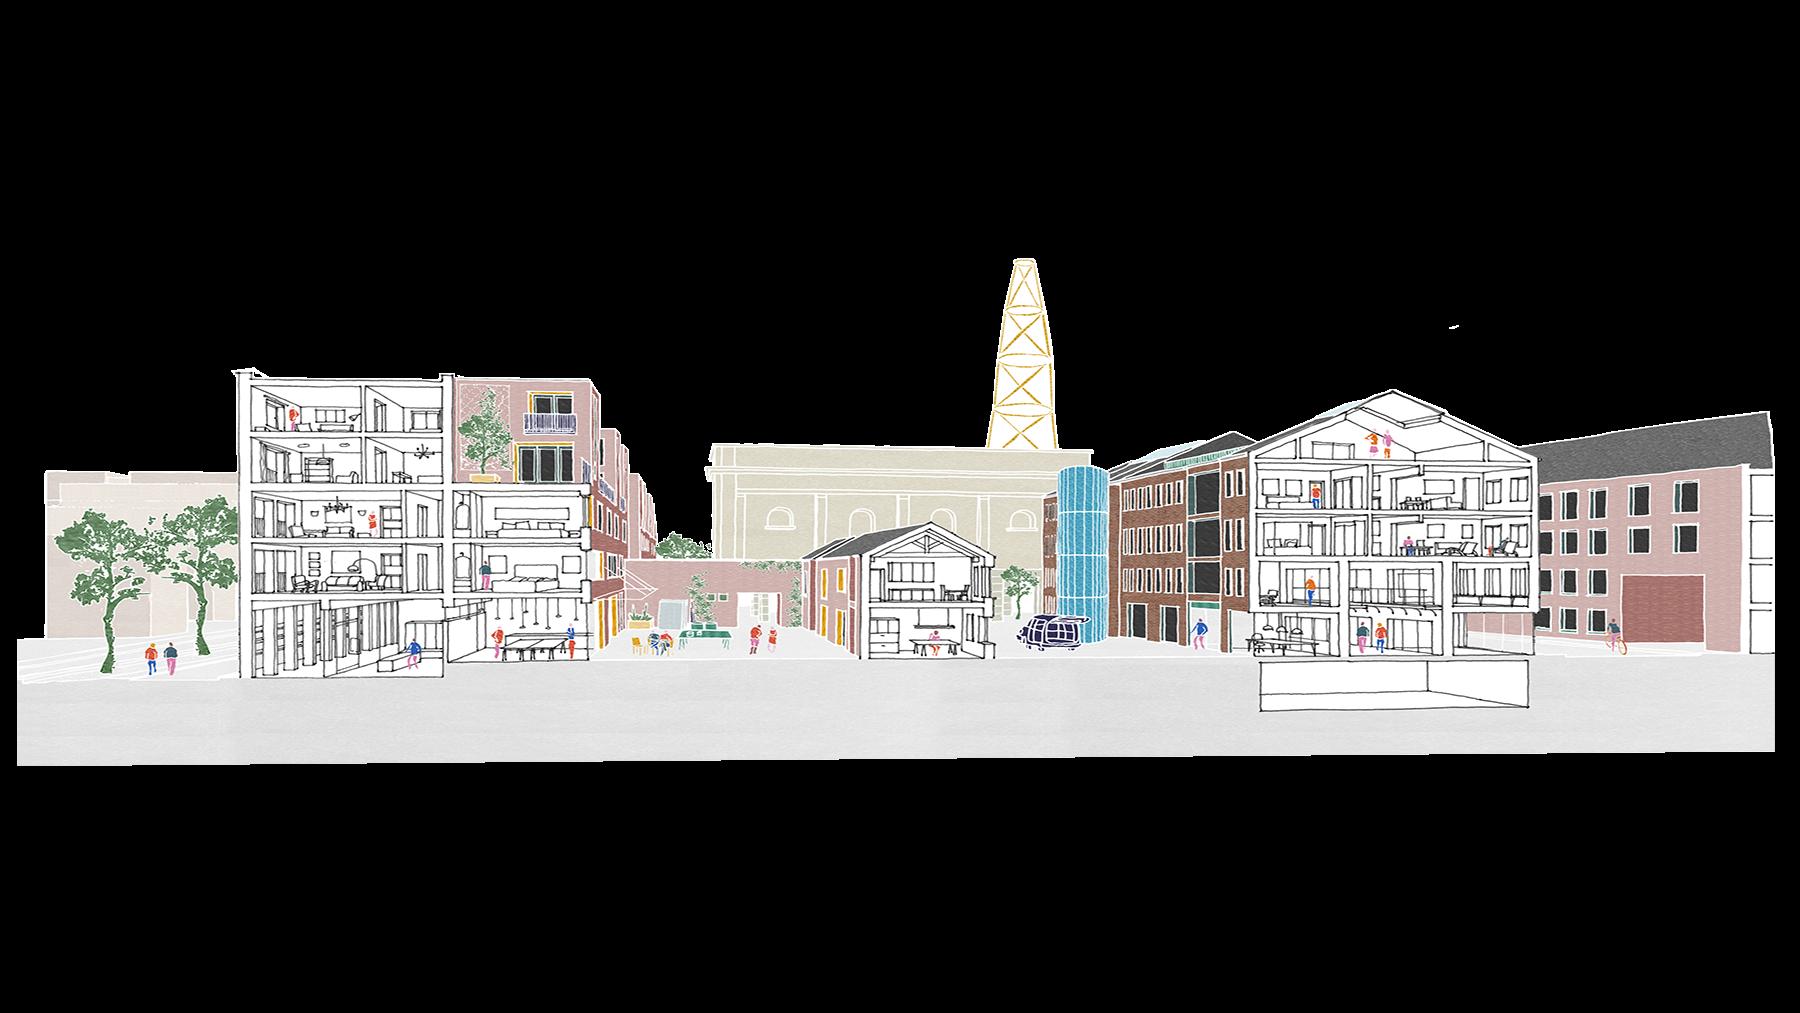 Sarah-Wigglesworth-Architects Unlocking-Pentonville Live-Work-Section Drawing 1800